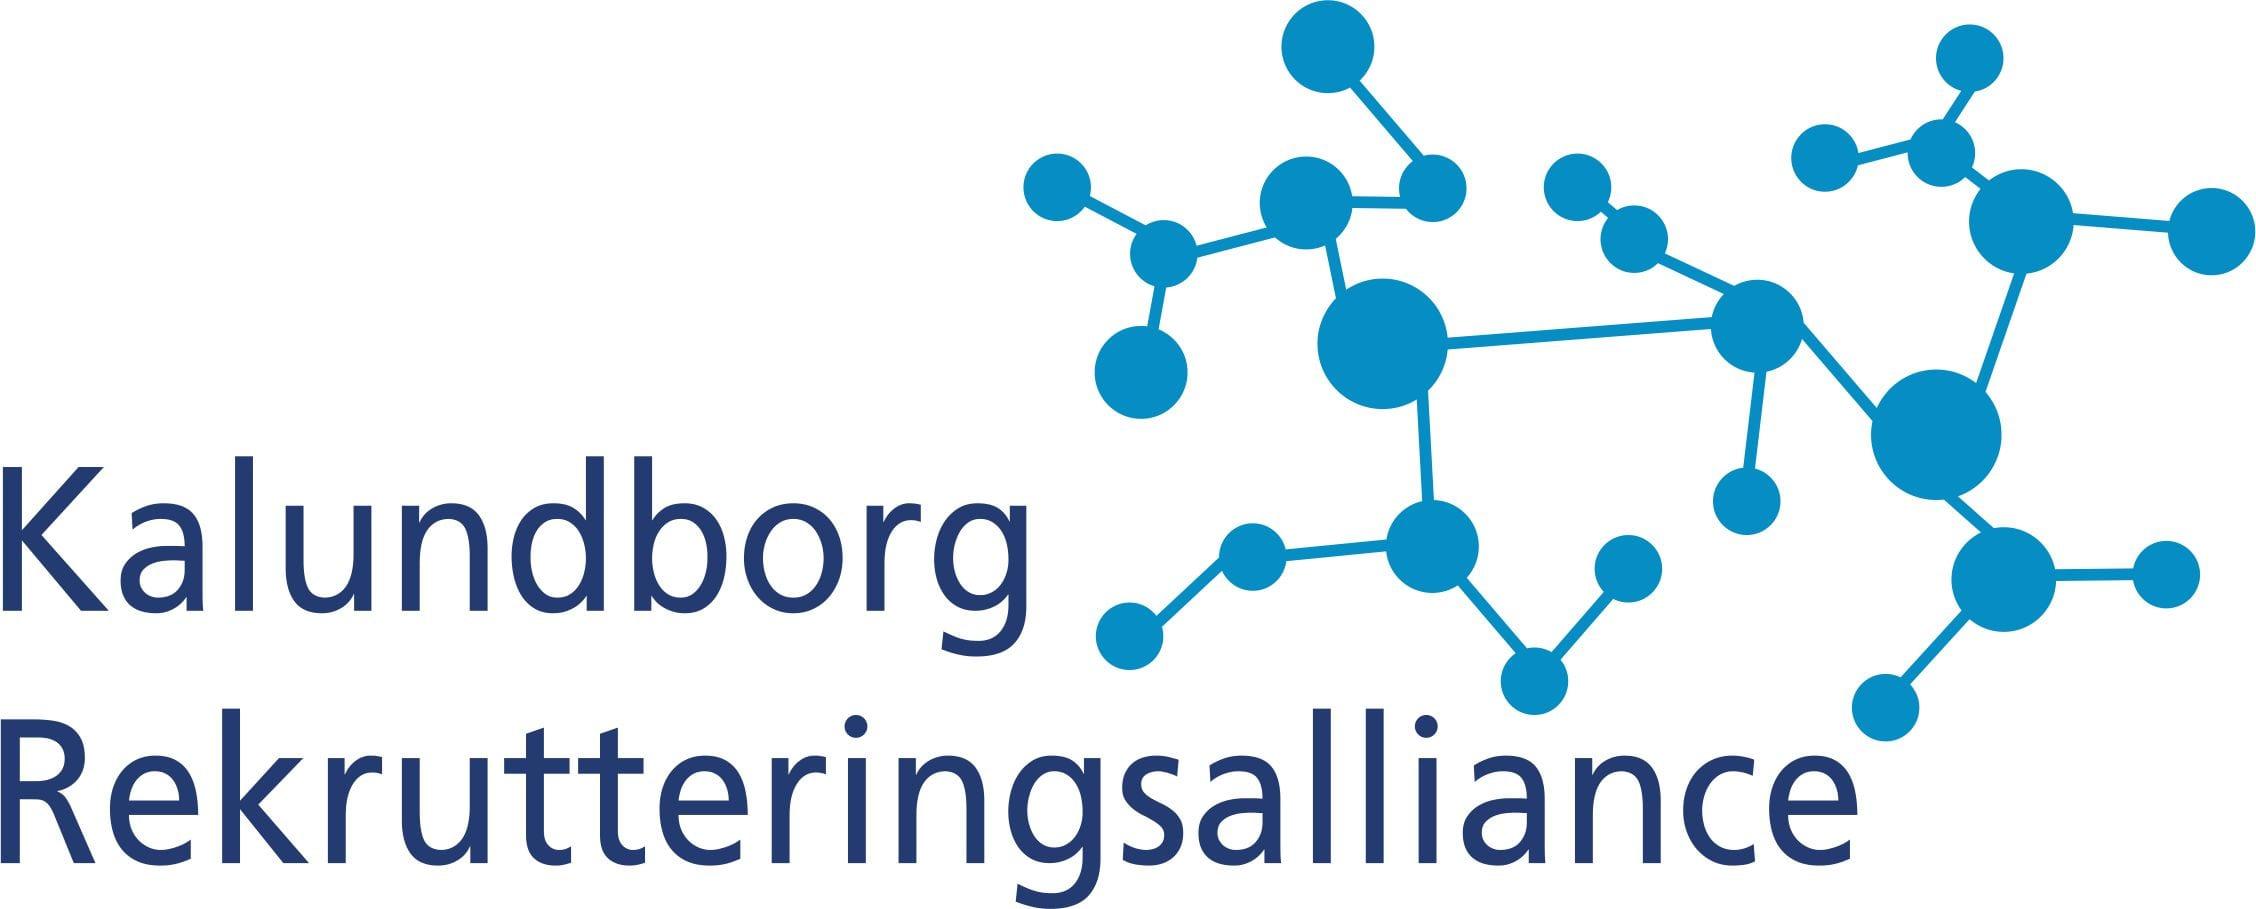 Rekrutteringsalliance logo